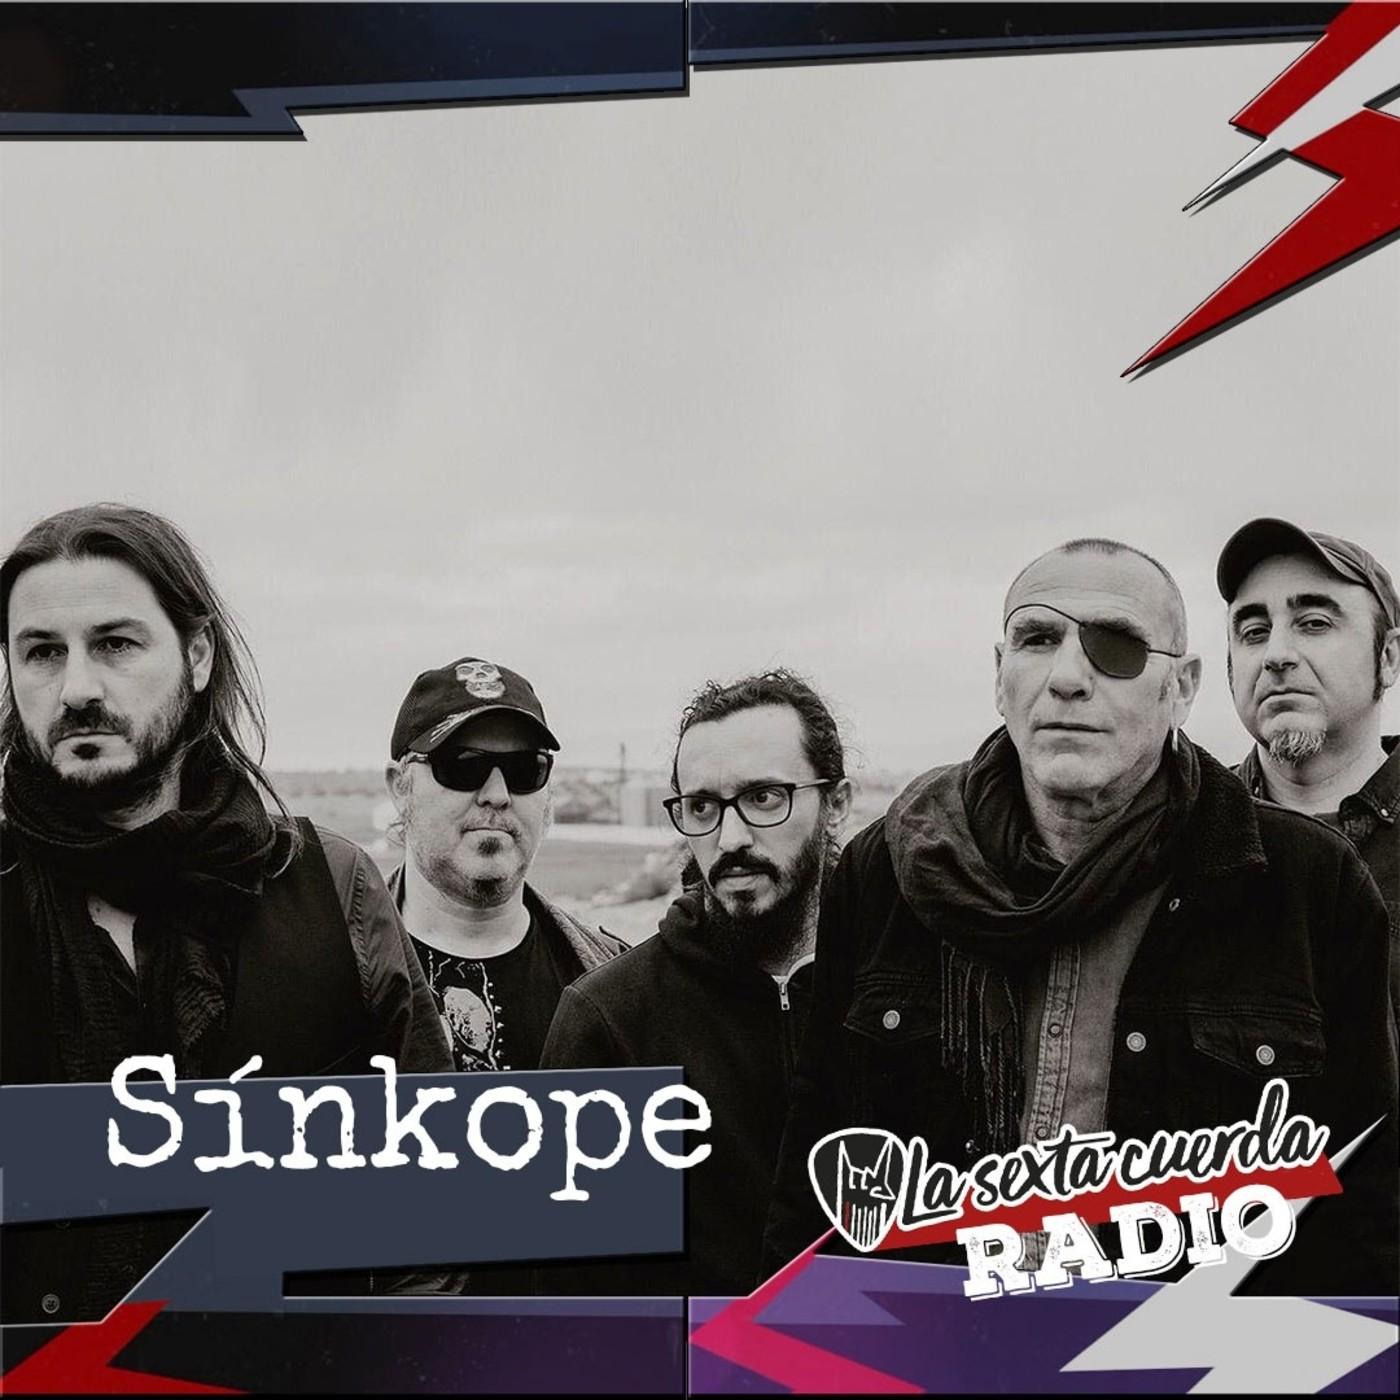 Sinkope - lasextacuerda.com